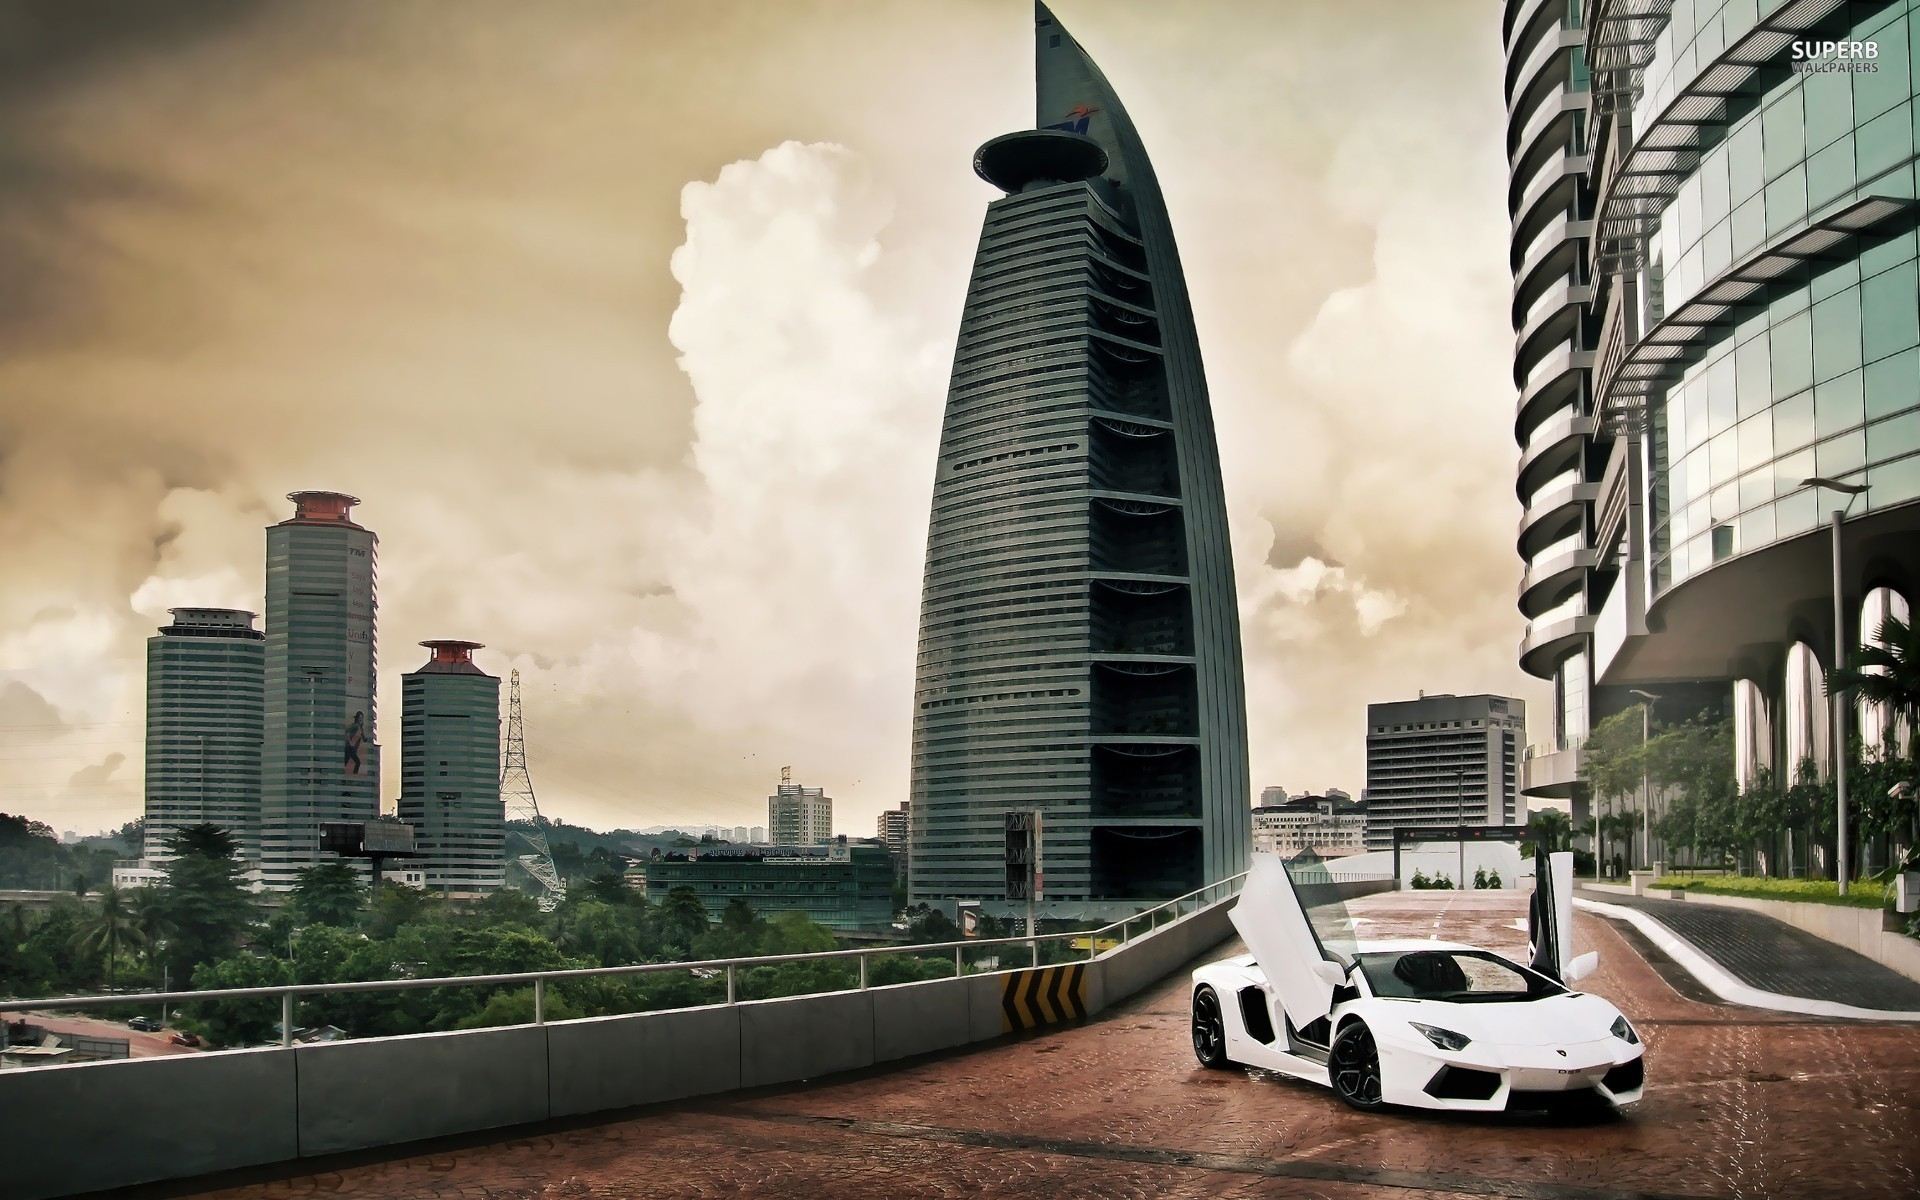 Lamborghini Aventador Wallpapers A35